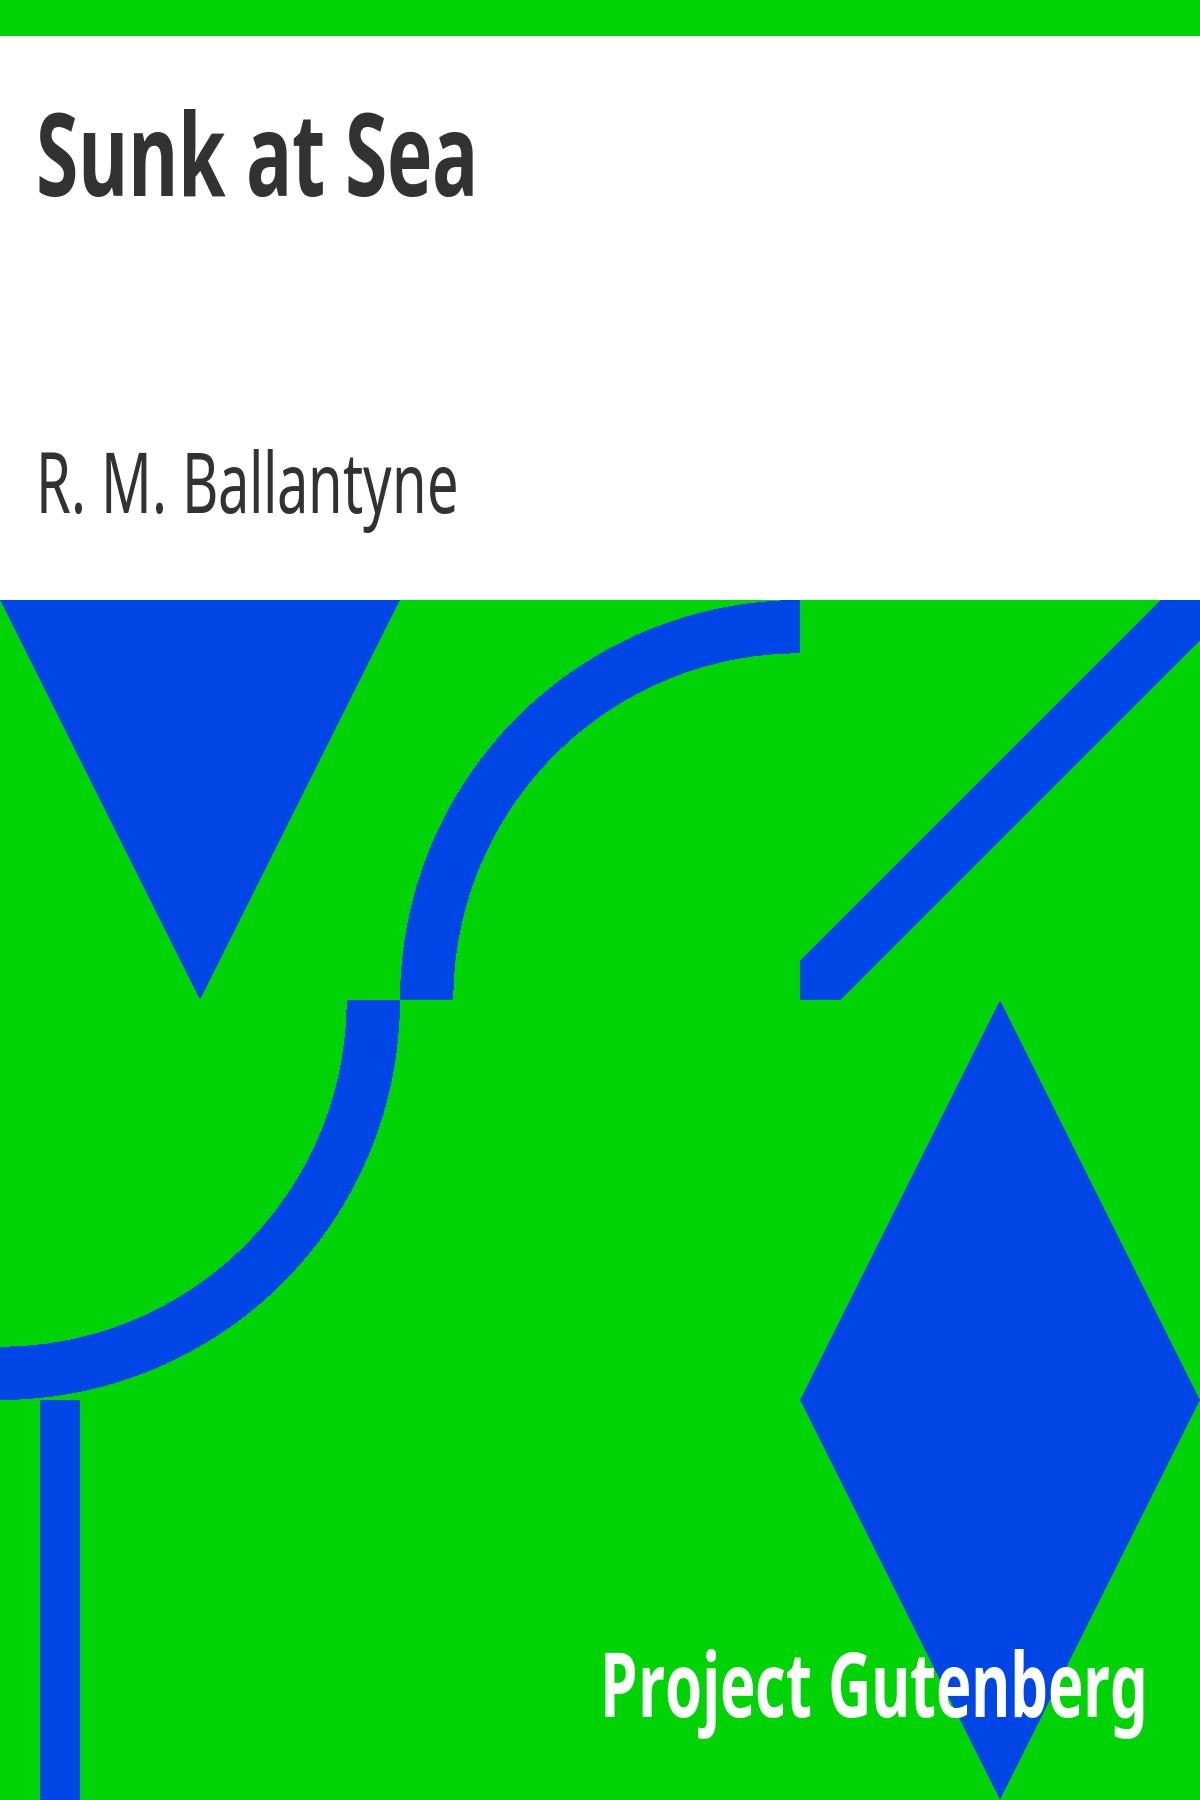 R. M. Ballantyne Sunk at Sea